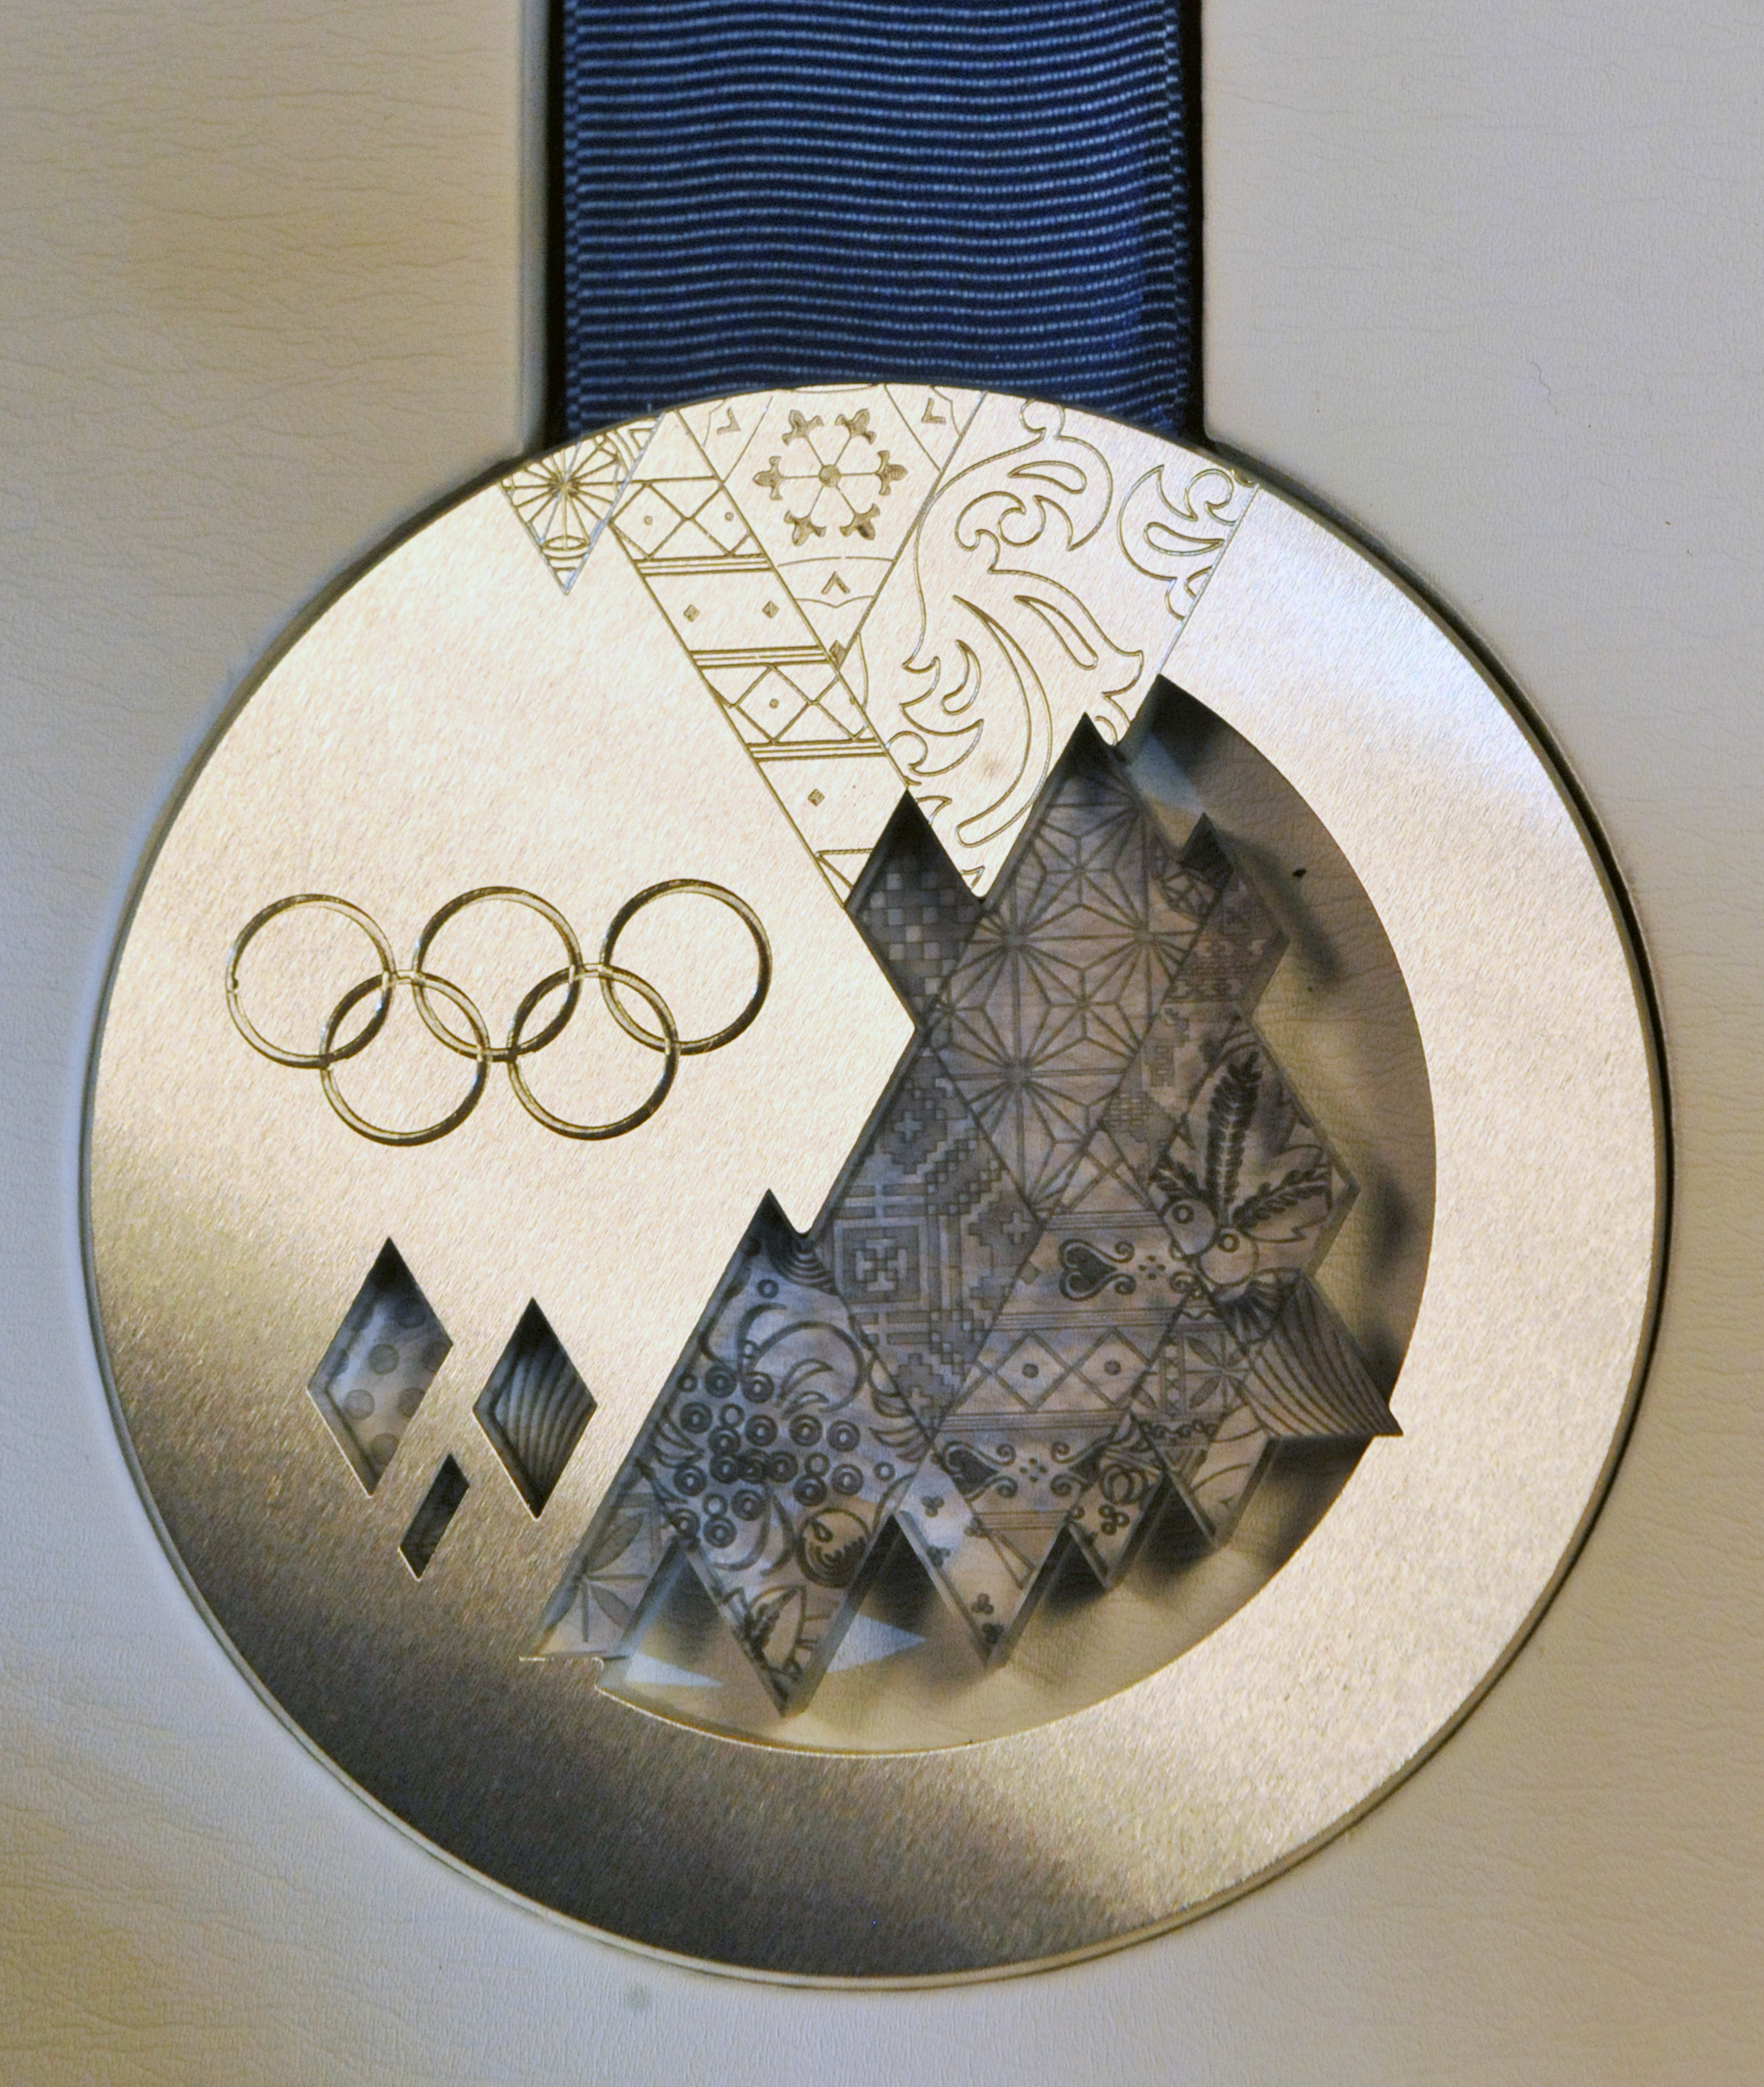 Talk Of Boycotting Russian Olympics Stirs Emotions